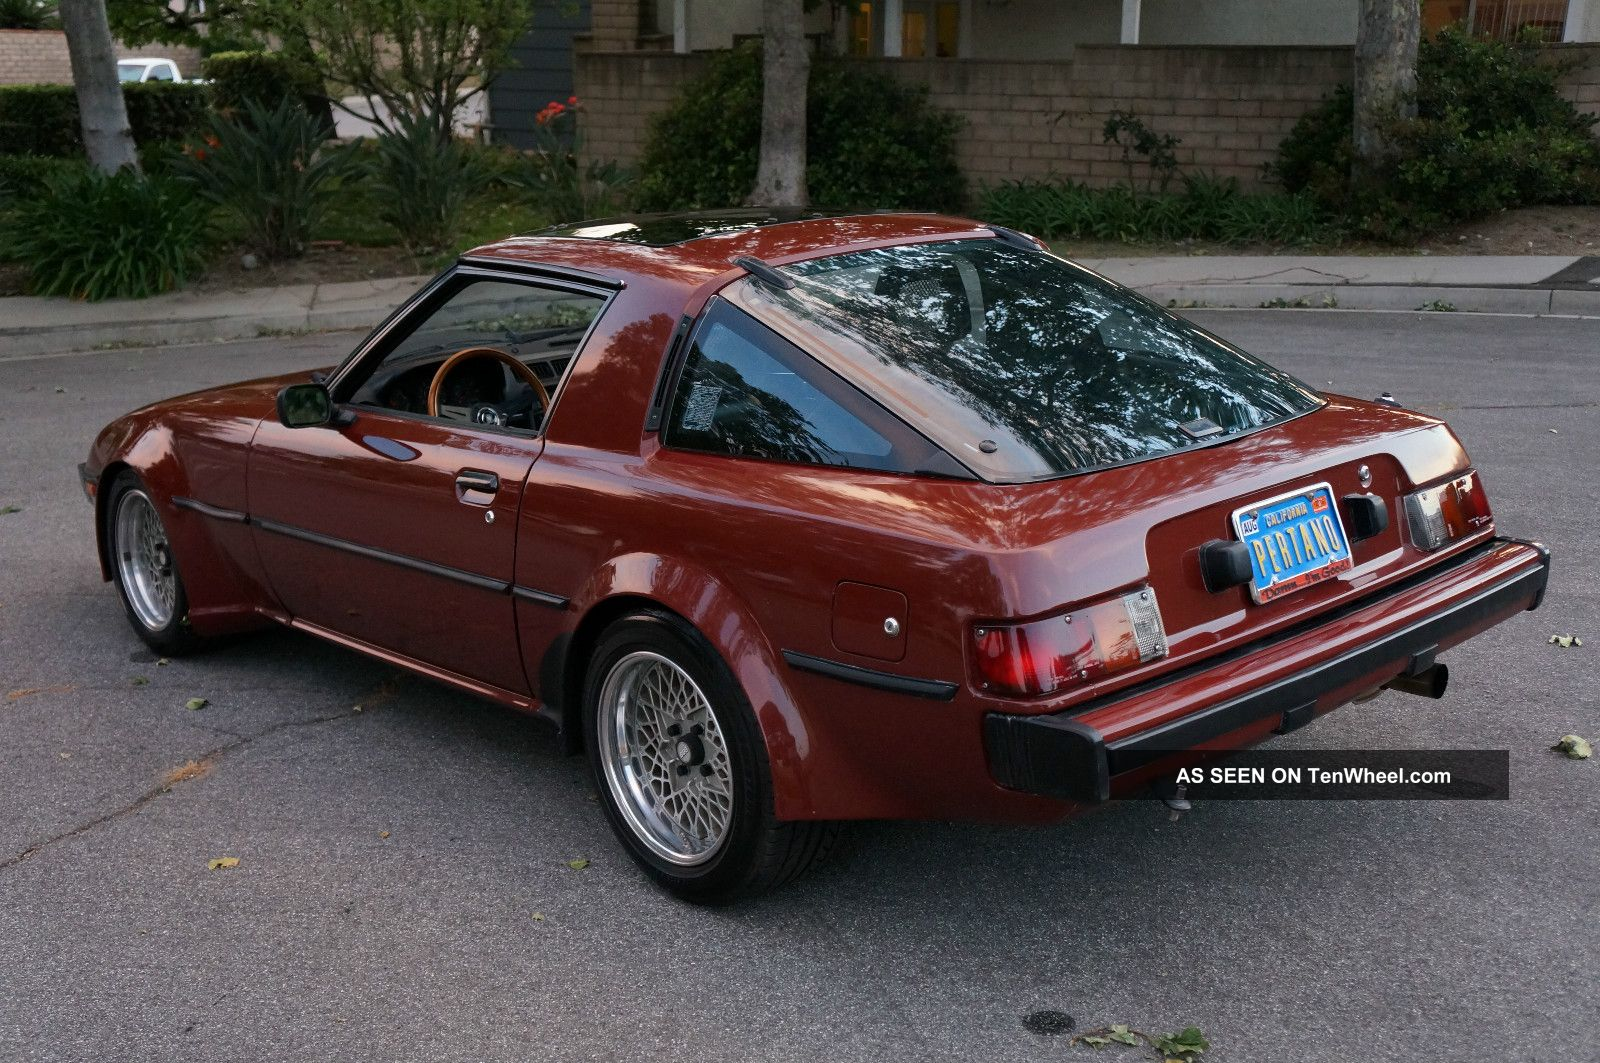 1980 Mazda Rx 7 Gs Coupe 2 Door 1 1l